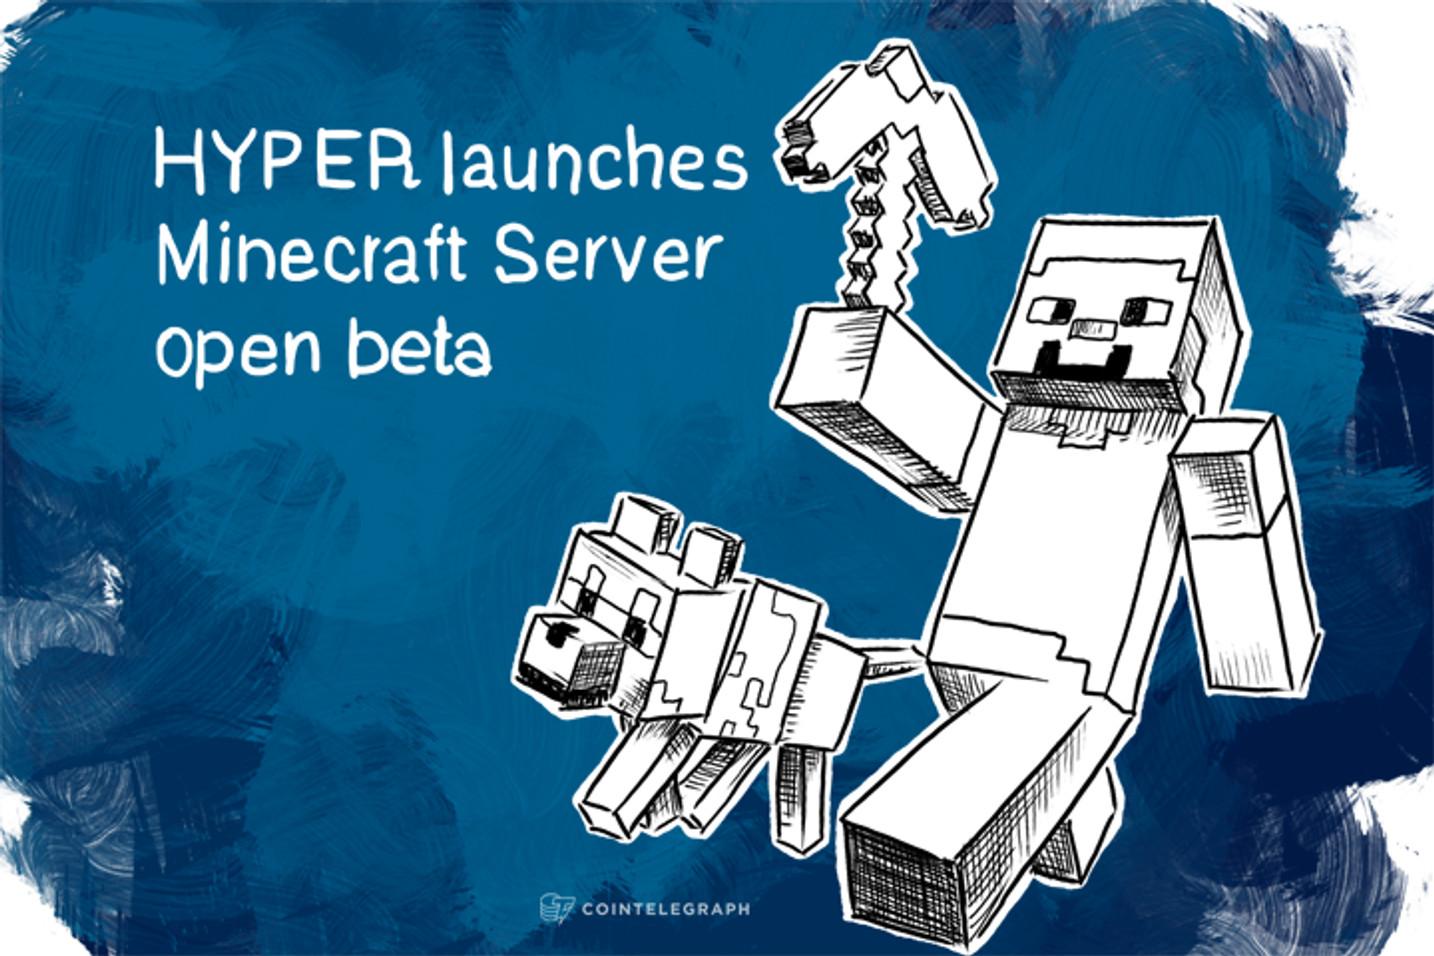 HYPER launches Minecraft Server open beta